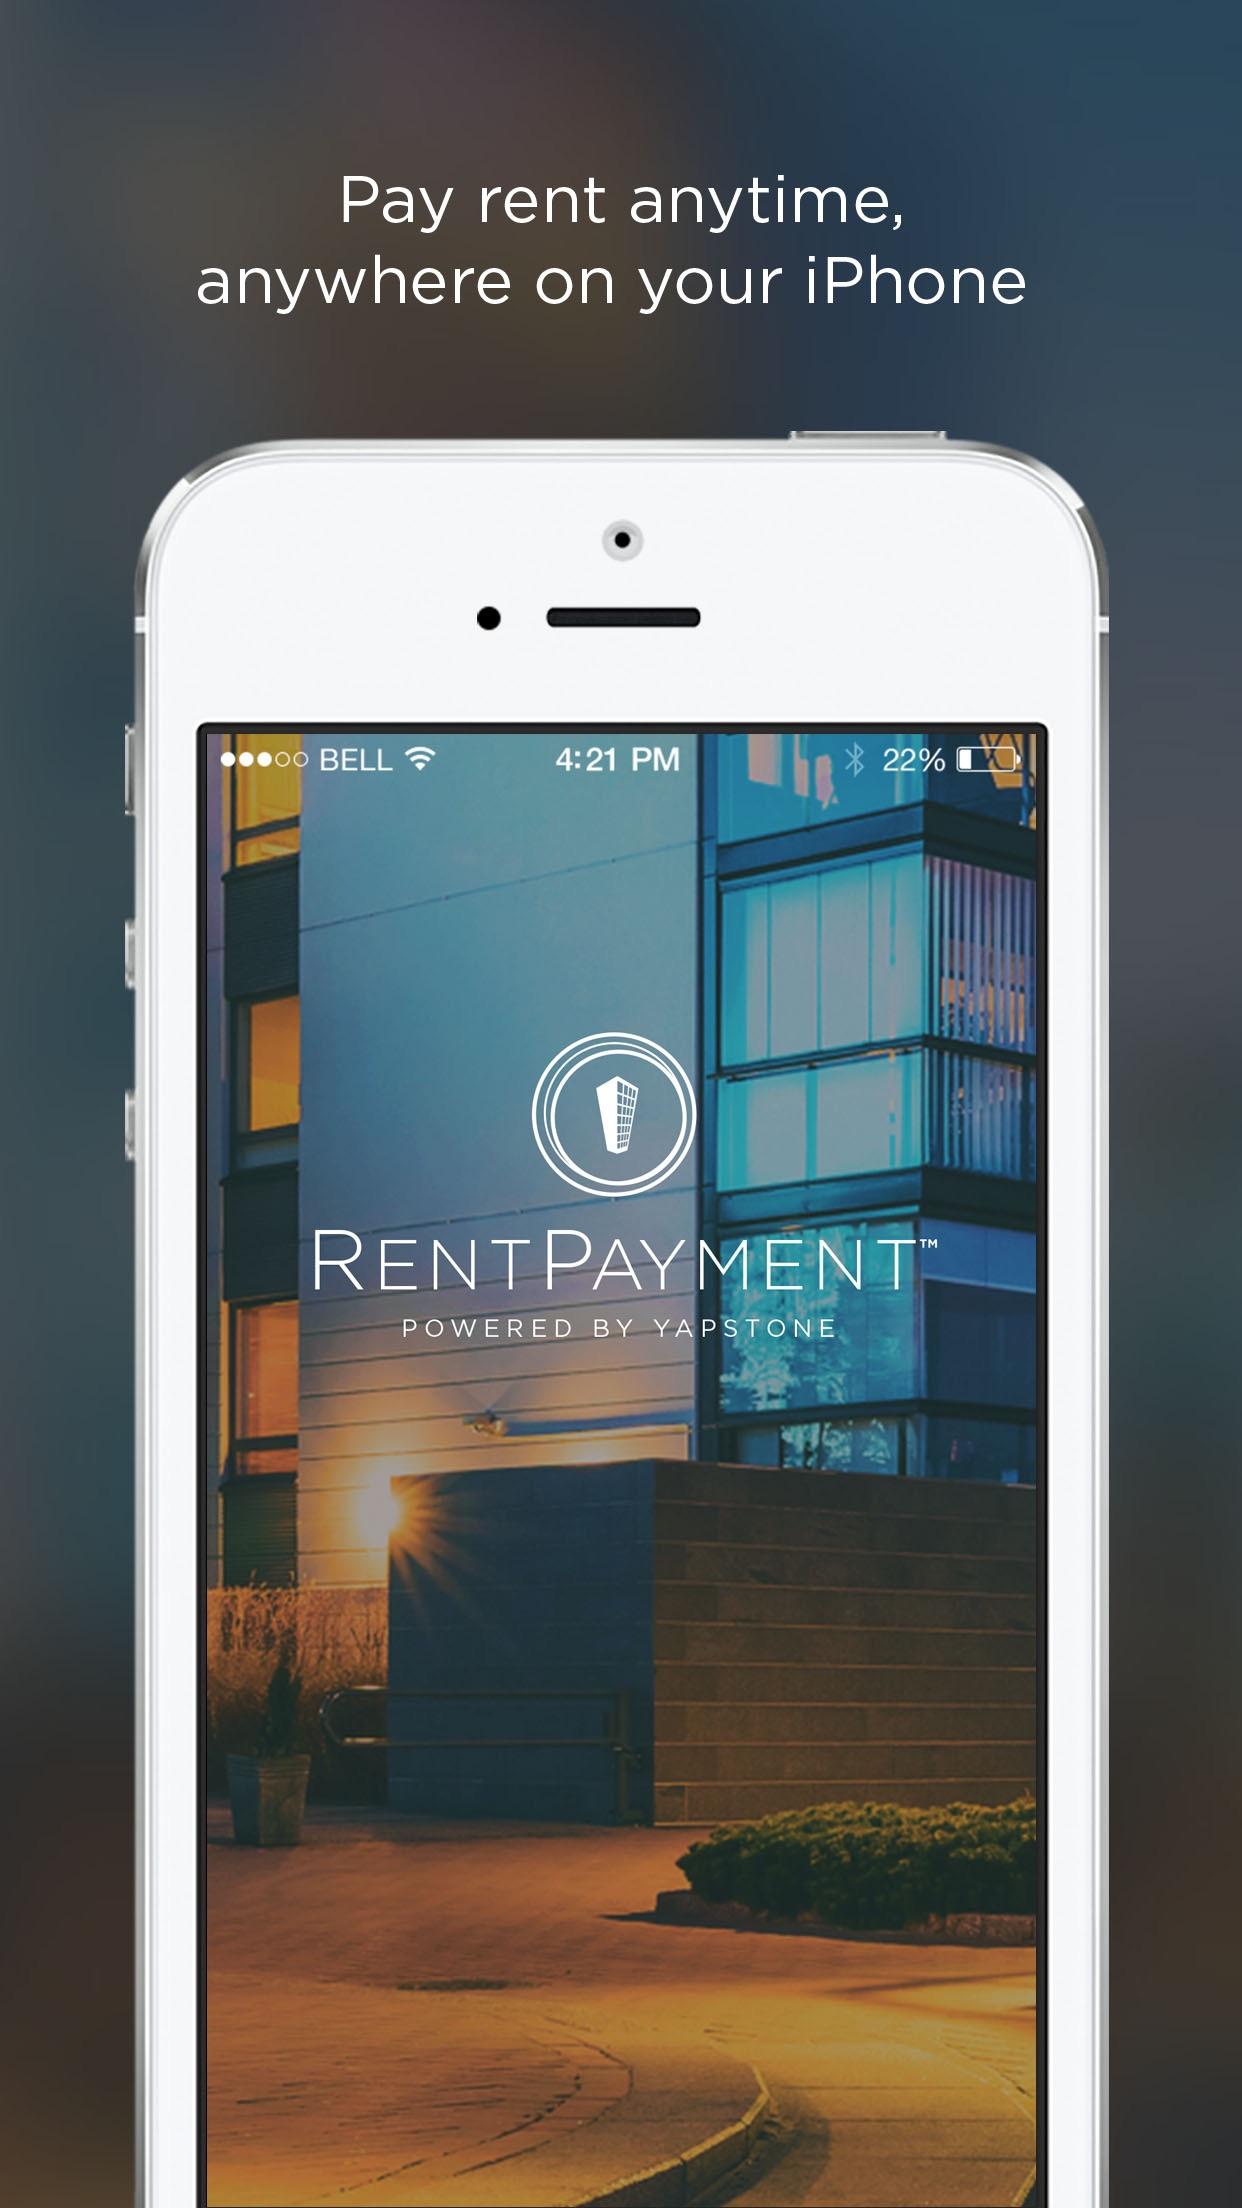 RentPayment – Powered by YapStone™ Screenshot